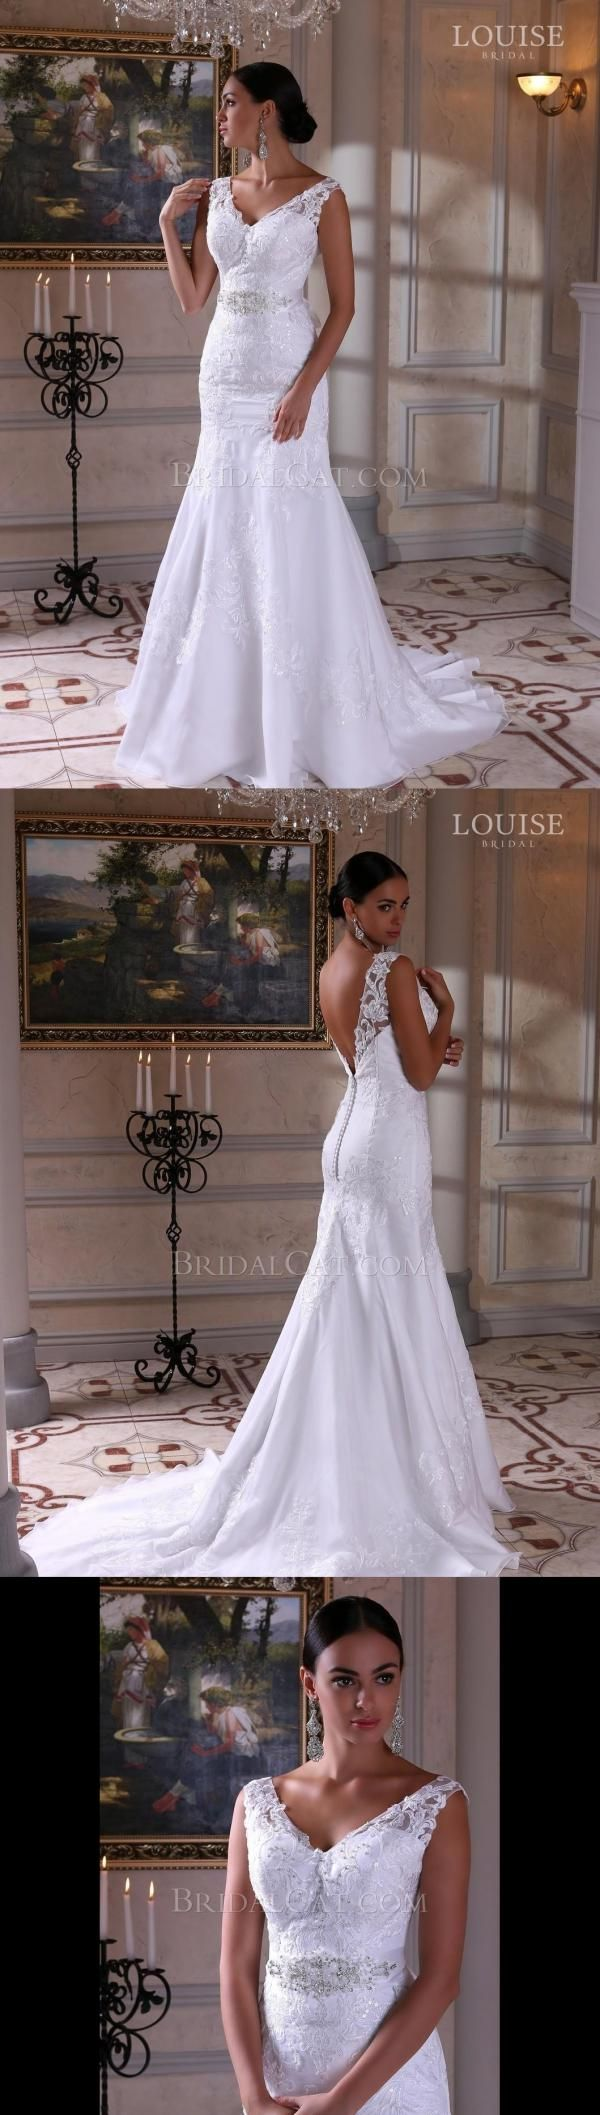 2015 Louise Bridal Nefertiti